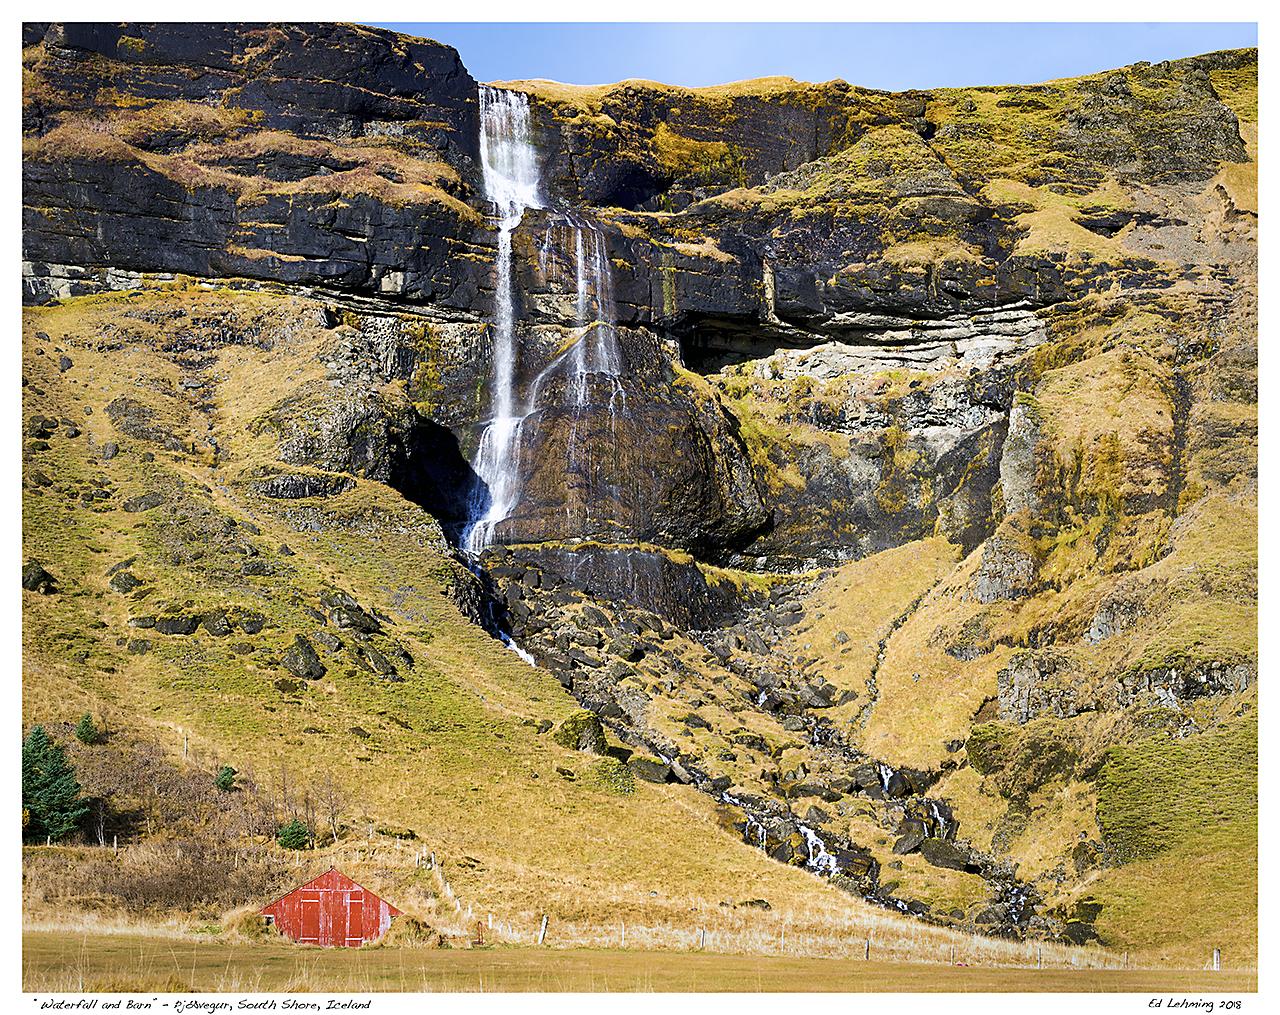 """Waterfall and Barn"" - Þjóðvegur, South Shore, Iceland"